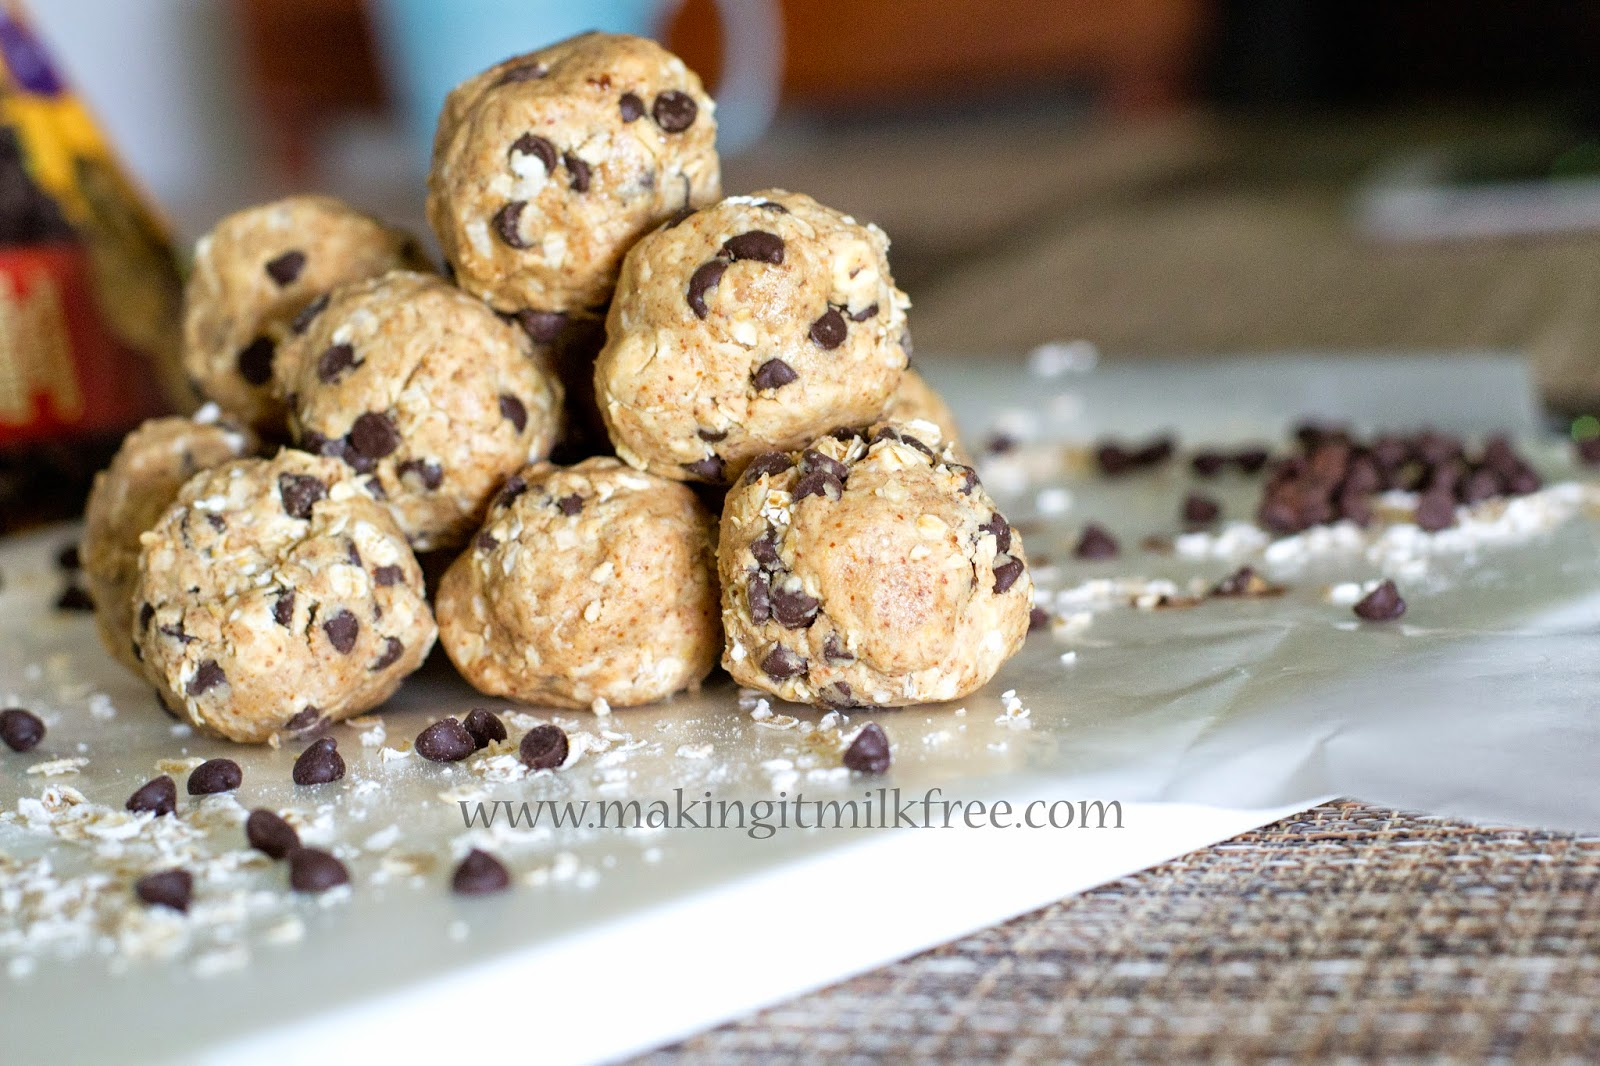 #glutenfree #dairyfree #eggfree #cookiedough #energybites #treats #snacks #funfood